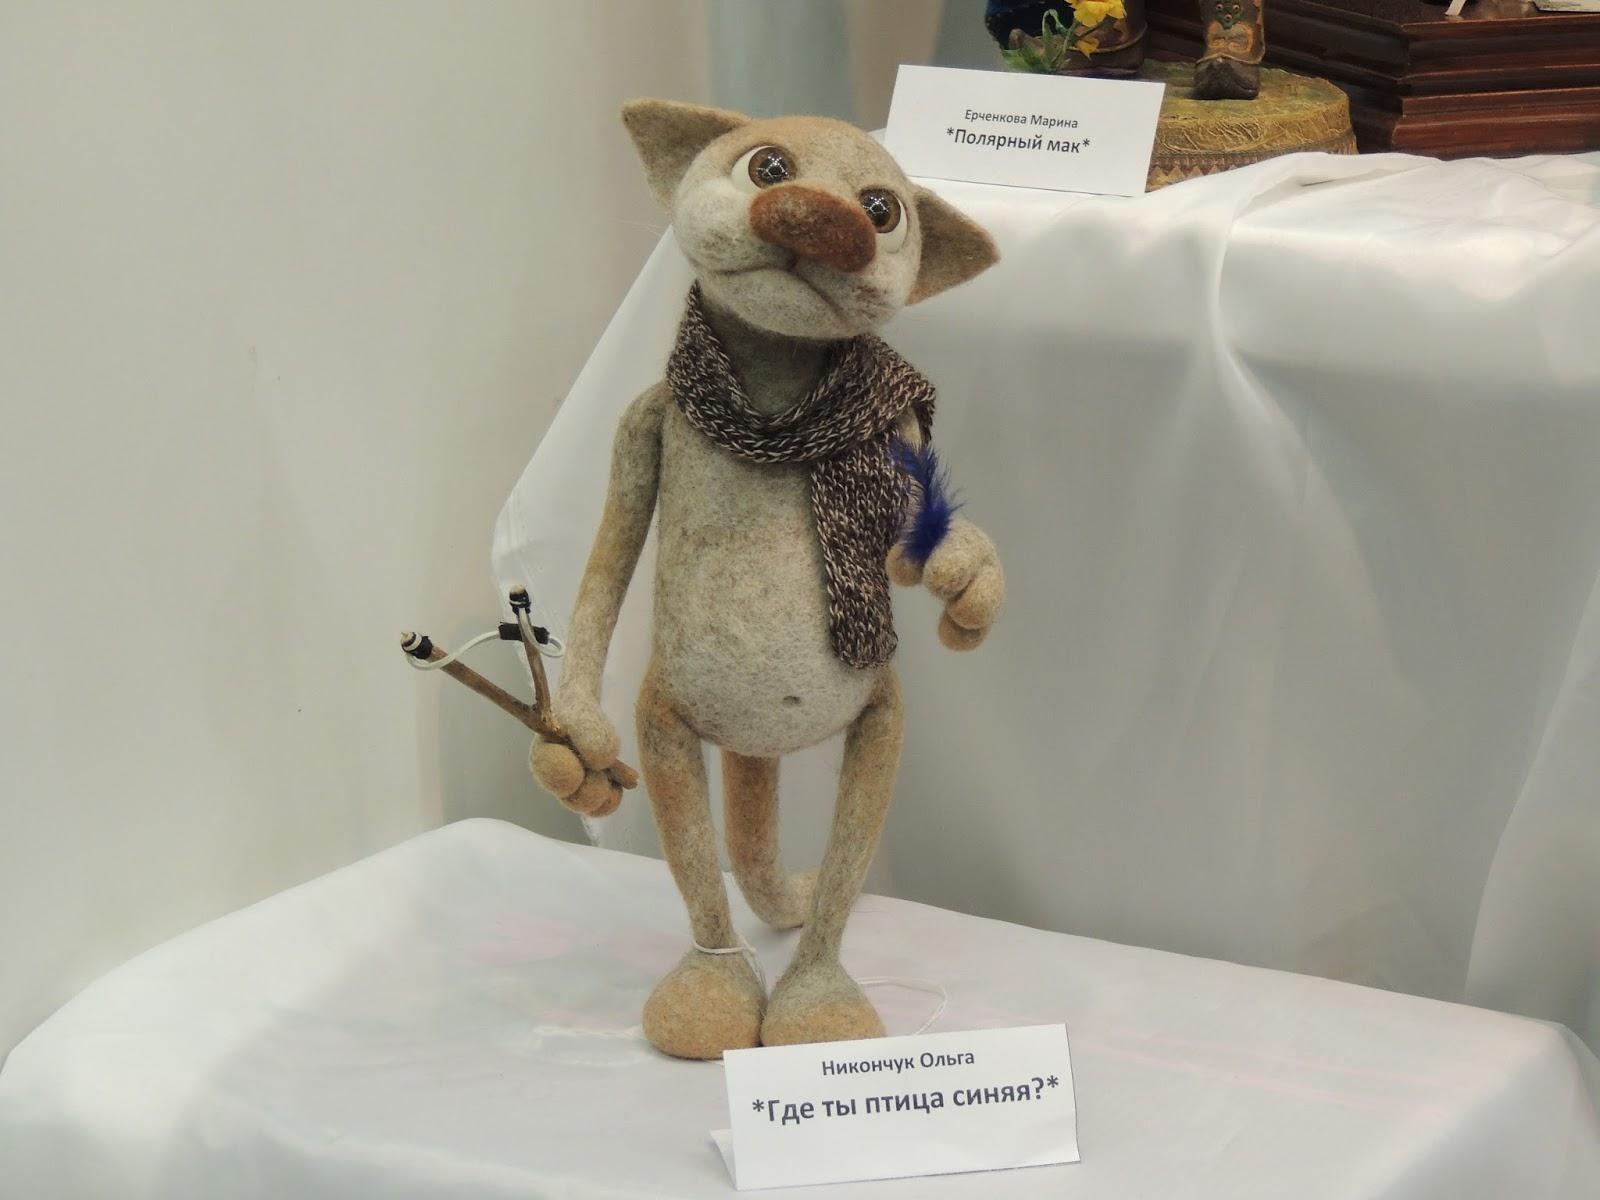 куклы,выставка,тишинка,салон,москва,кот,котик,валяние